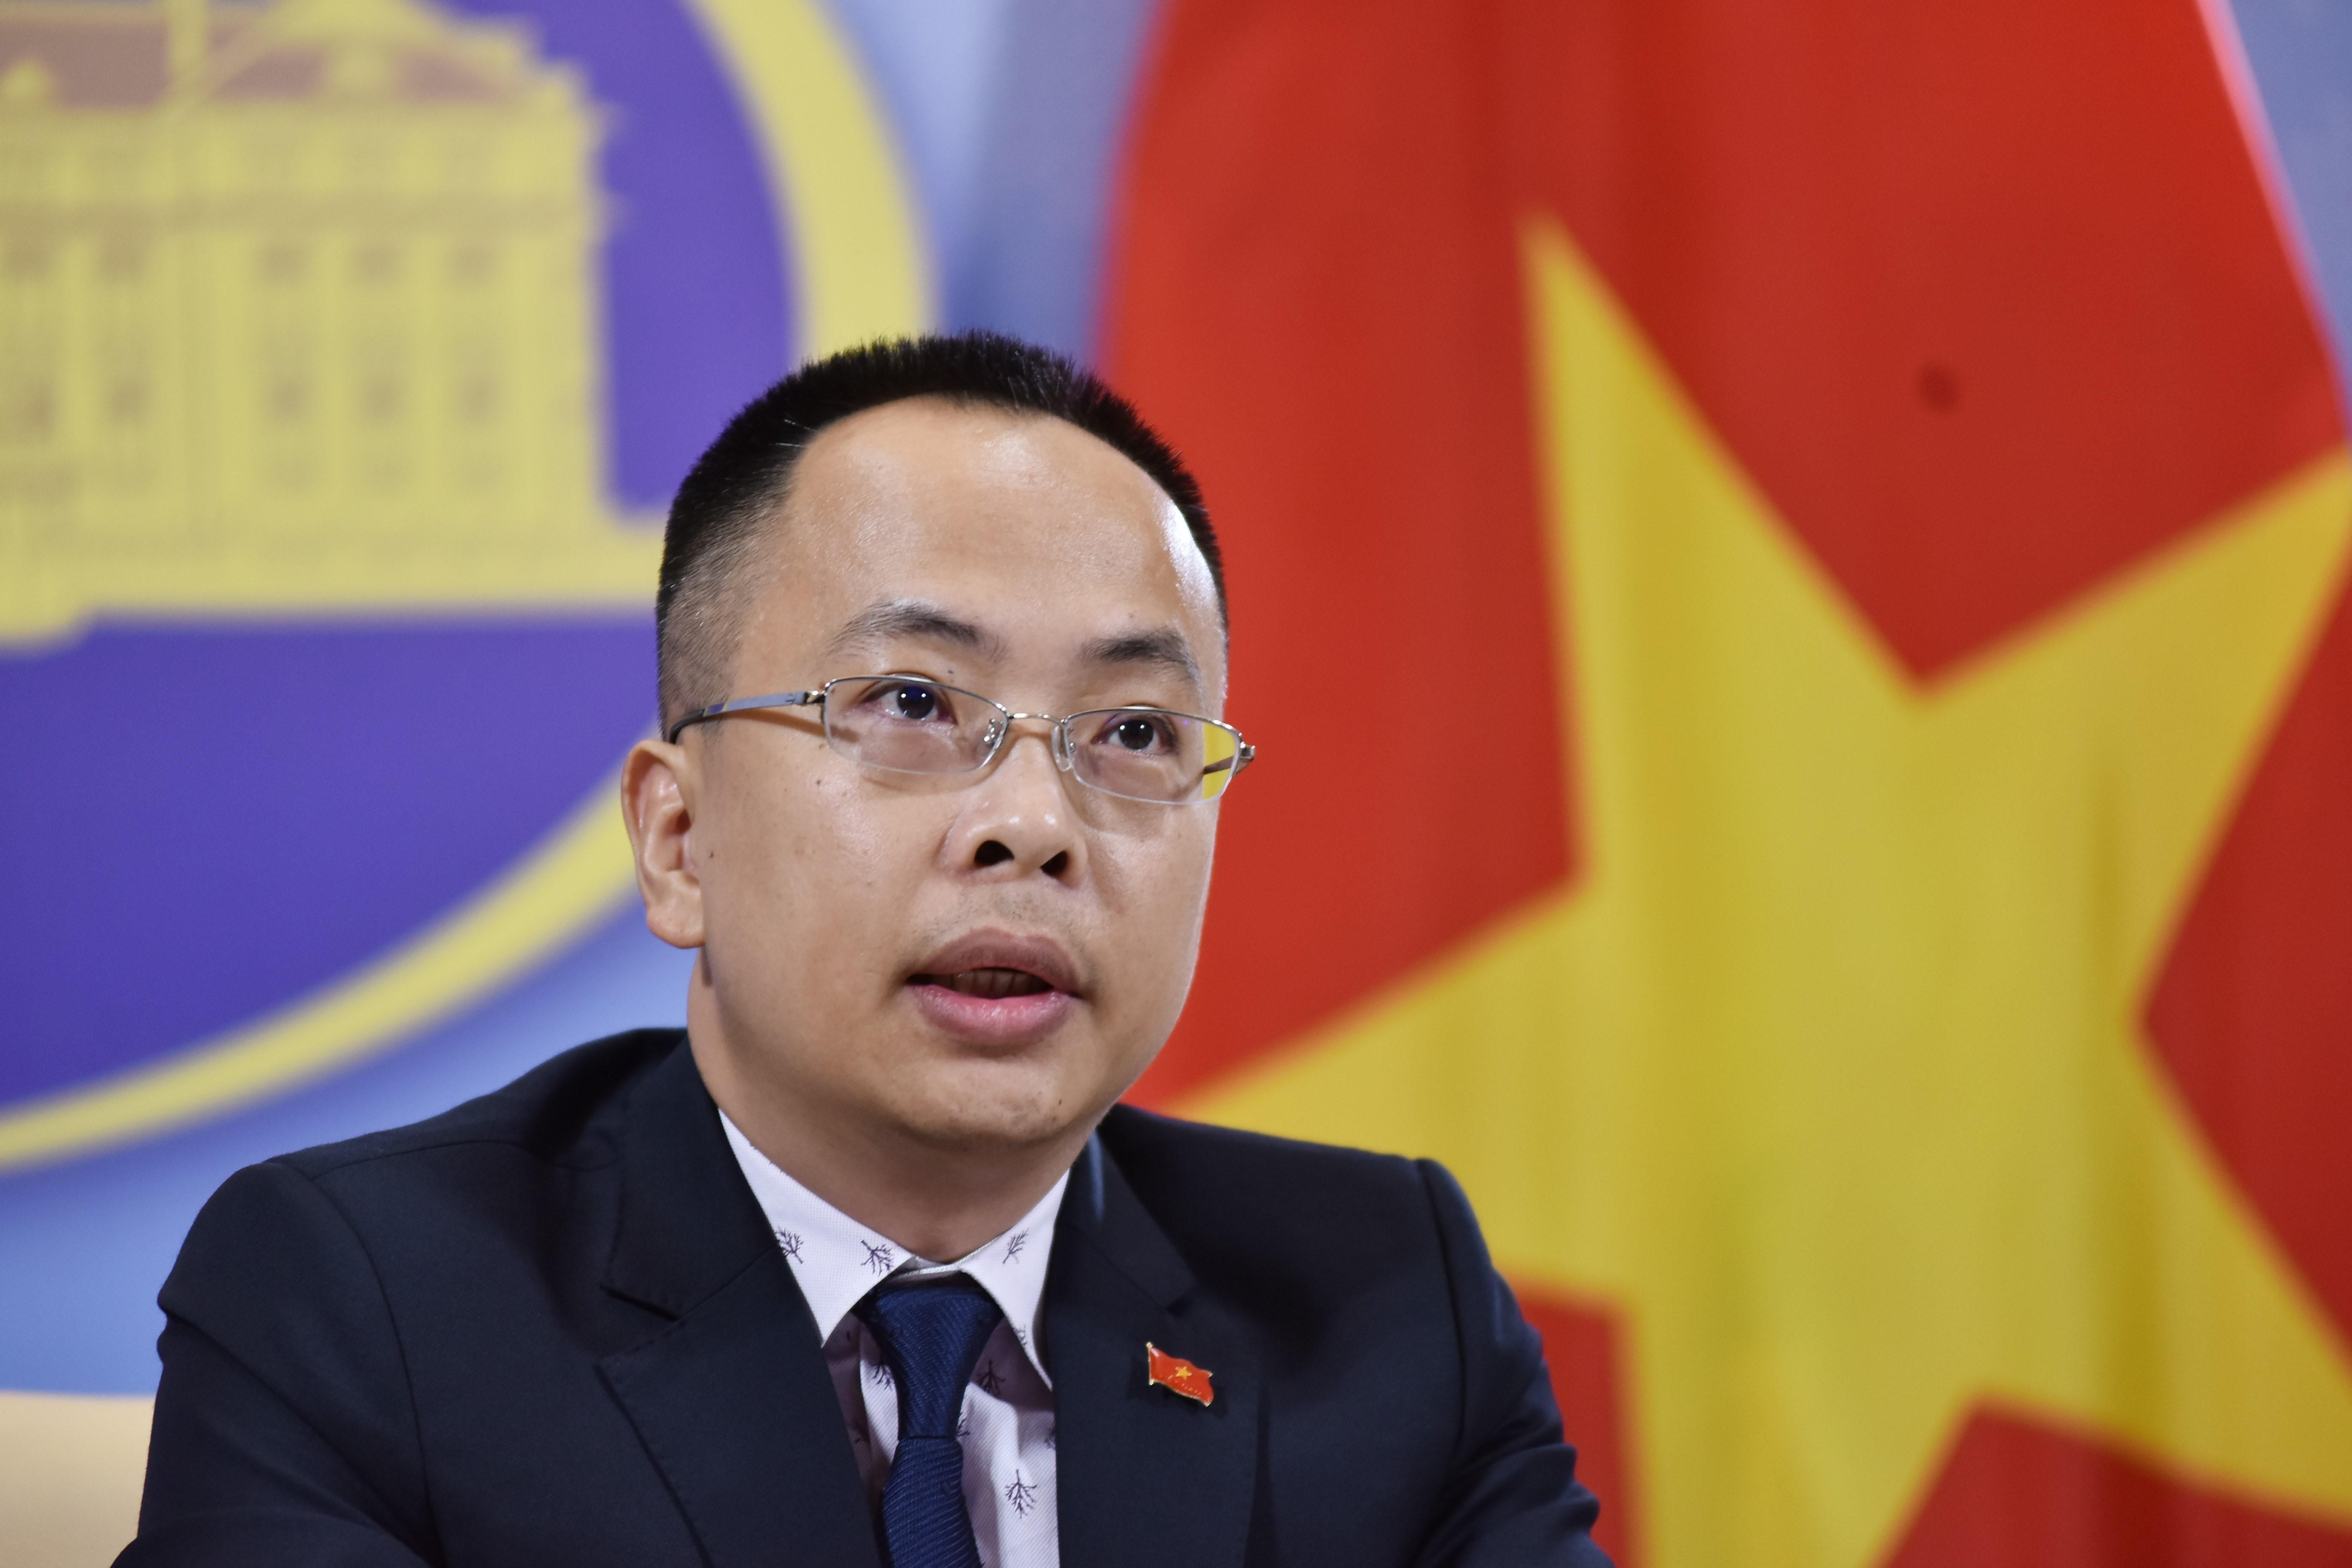 Vice-spokesman of Vietnam's Ministry of Foreign Affairs Doan Khac Viet. Photo: Vietnam News Agency